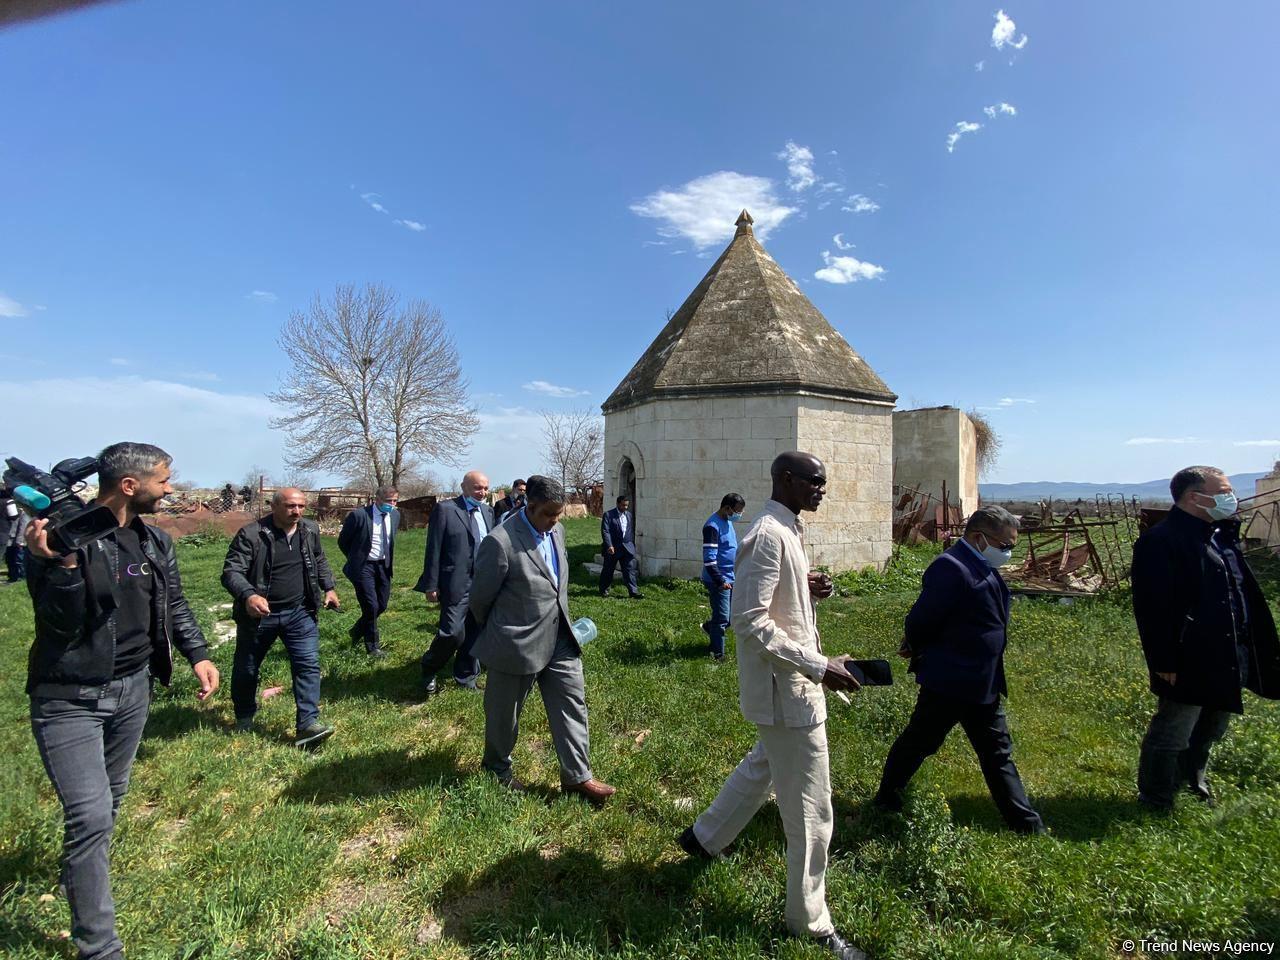 OIC Reps Visit Ibrahim Khalil Khan Palace in Azerbaijan's Aghdam District